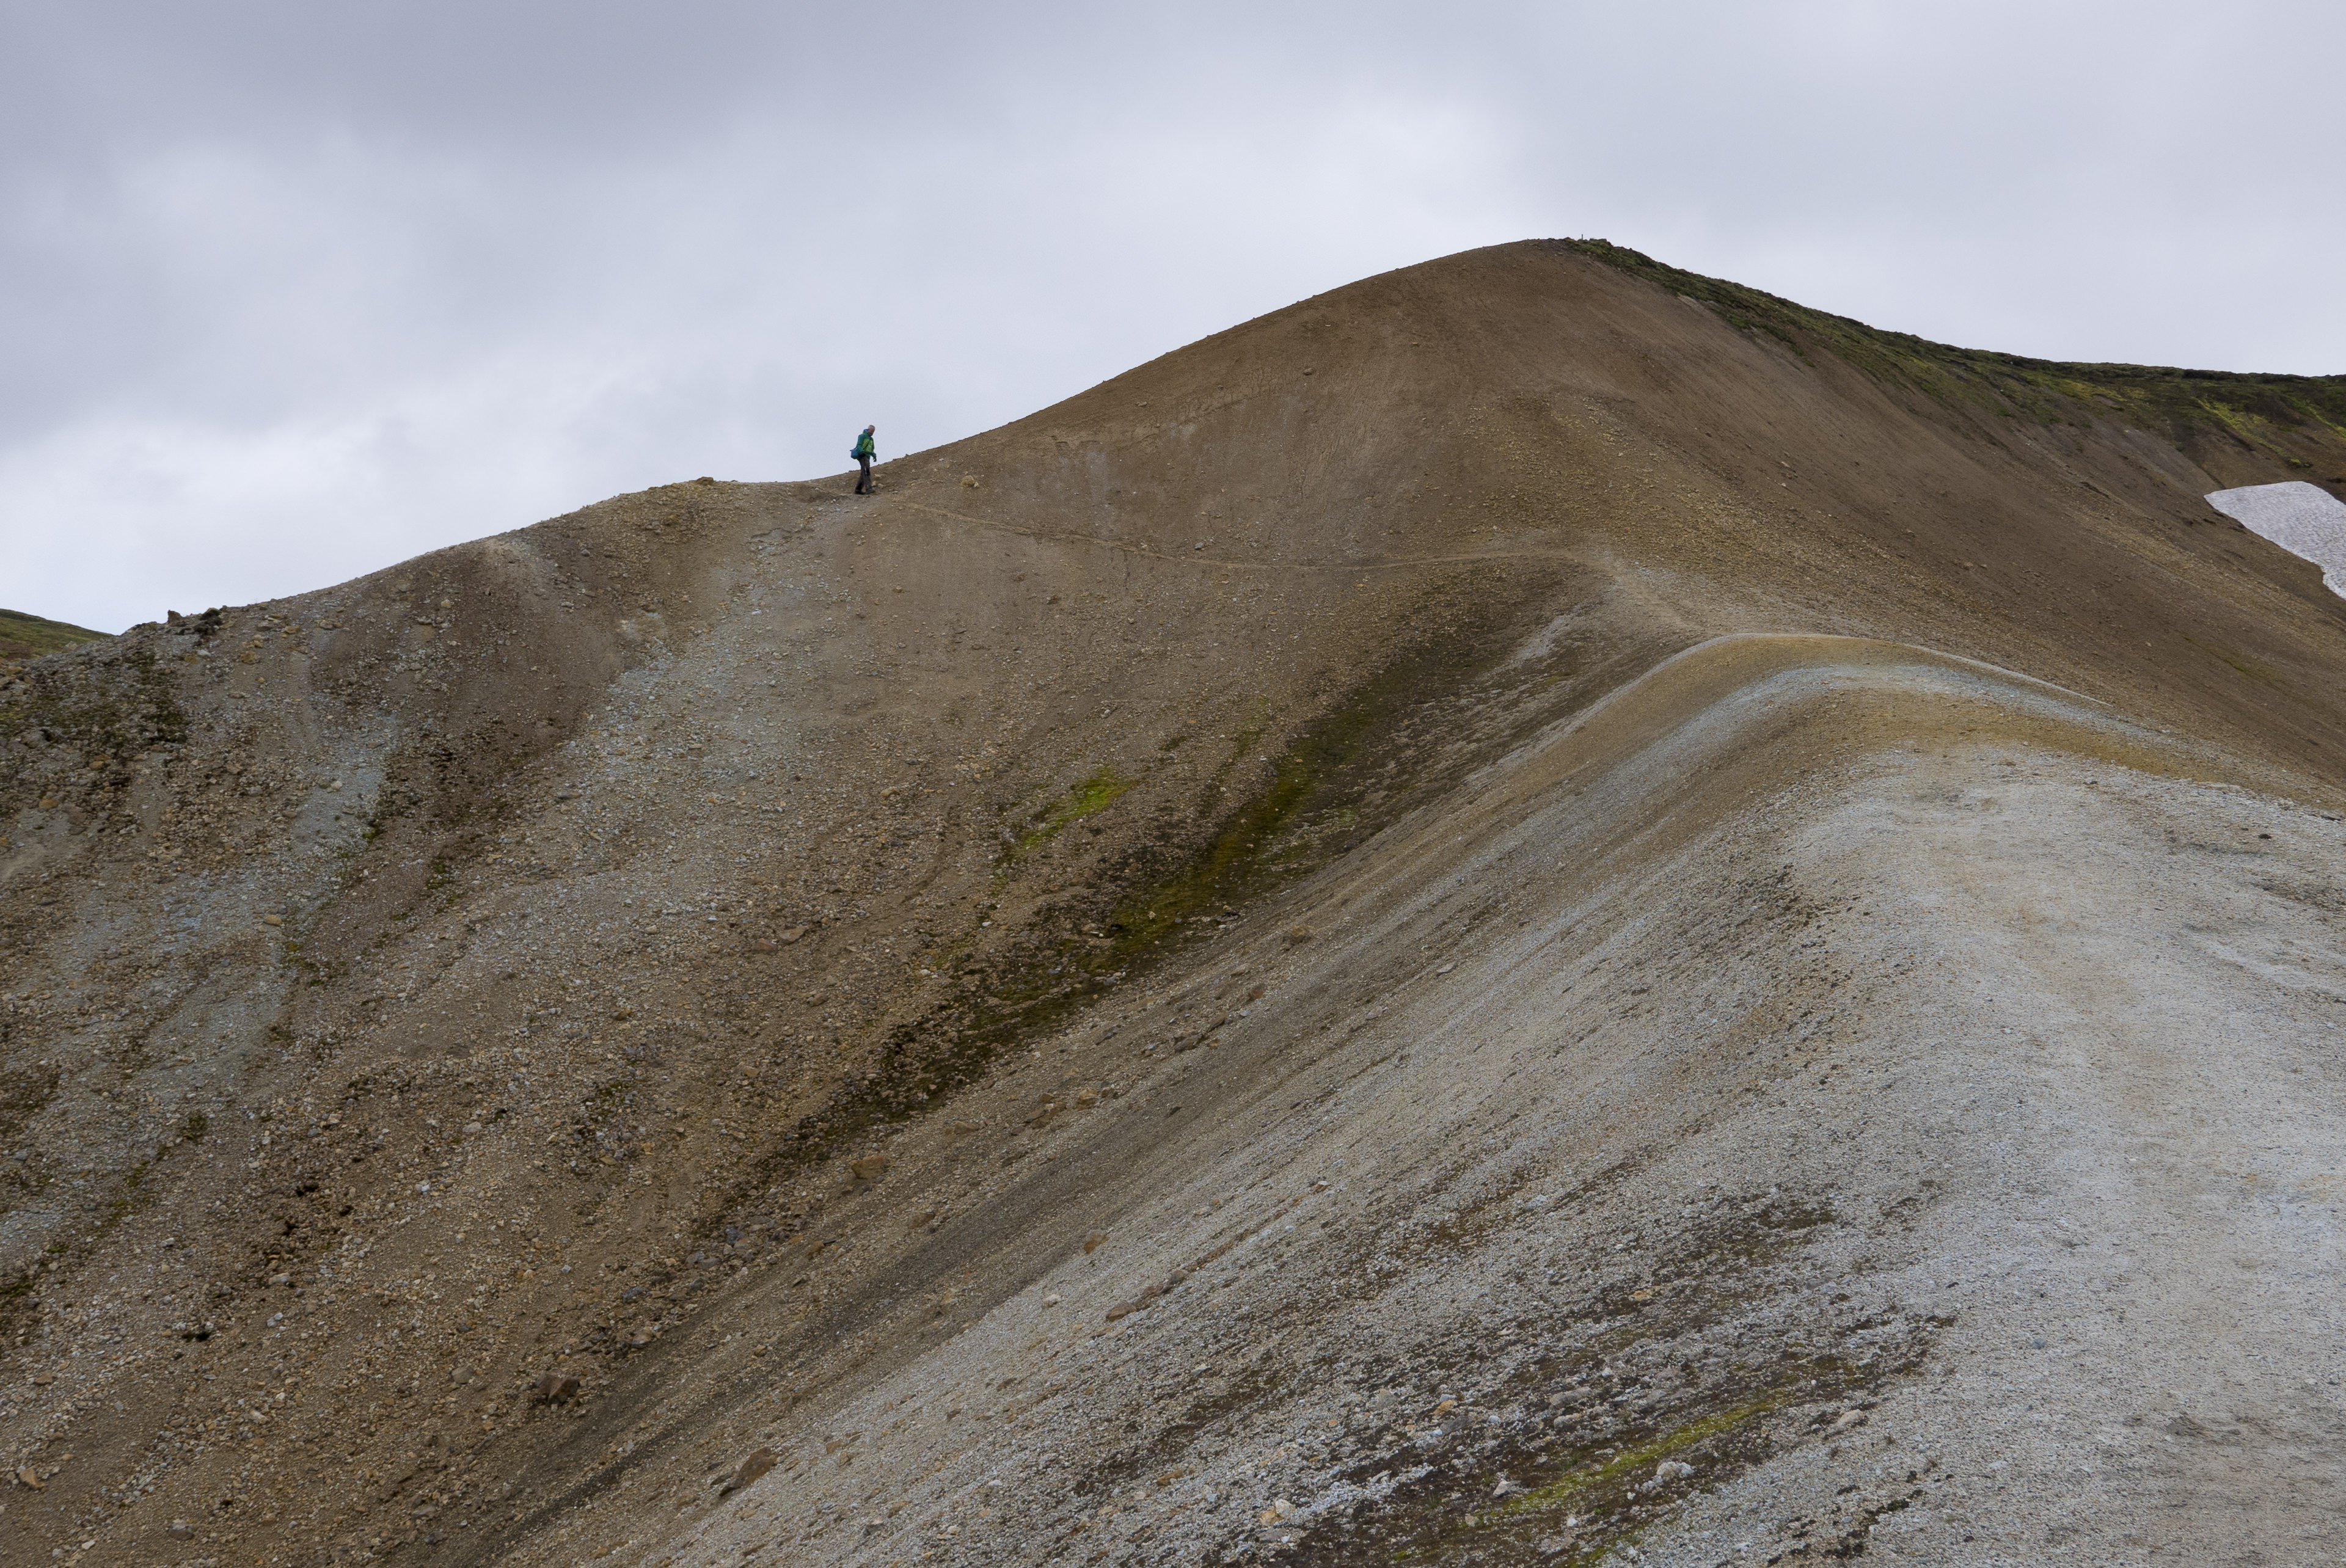 Abstieg,©Elisabeth Zenz—Panasonic DMC-LX100, 16.5mm, 1/500s, Blende 5.6, ISO 200